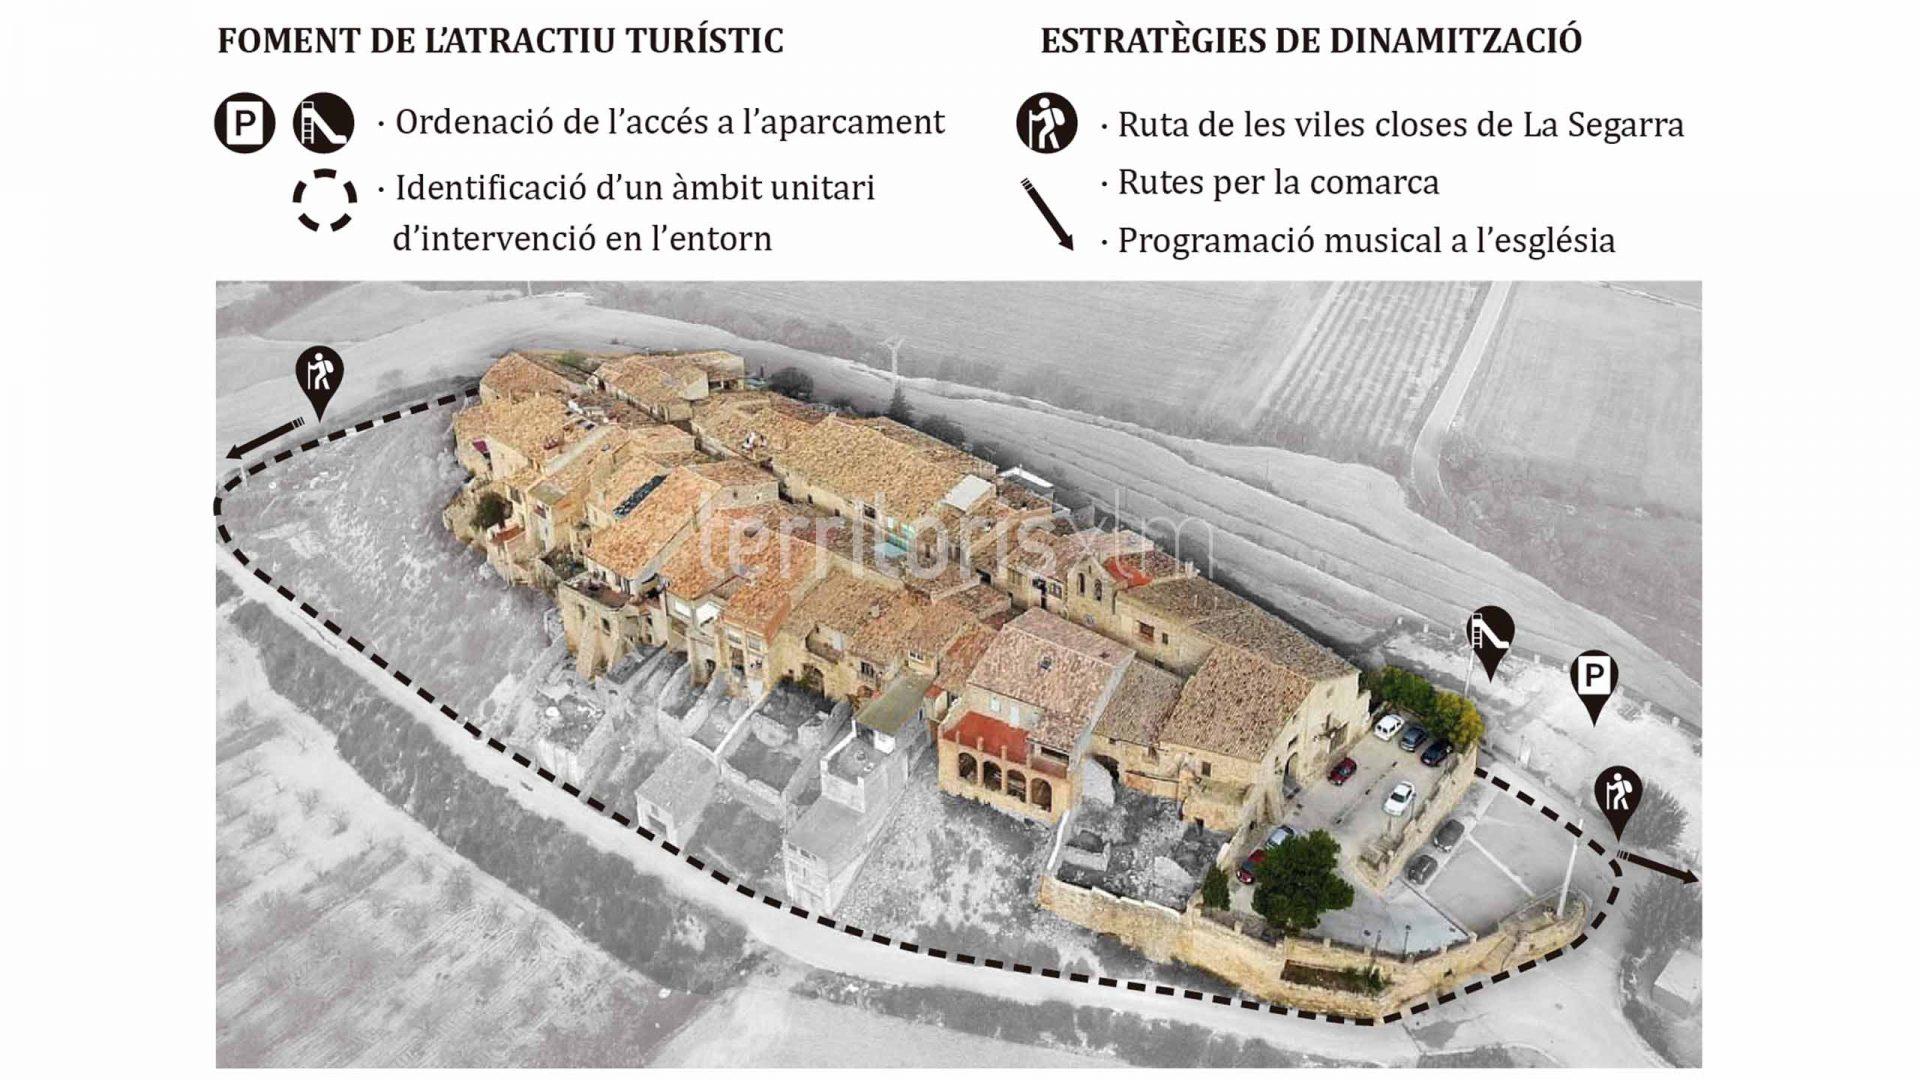 dinamitzacio-i-atractiu-turistic